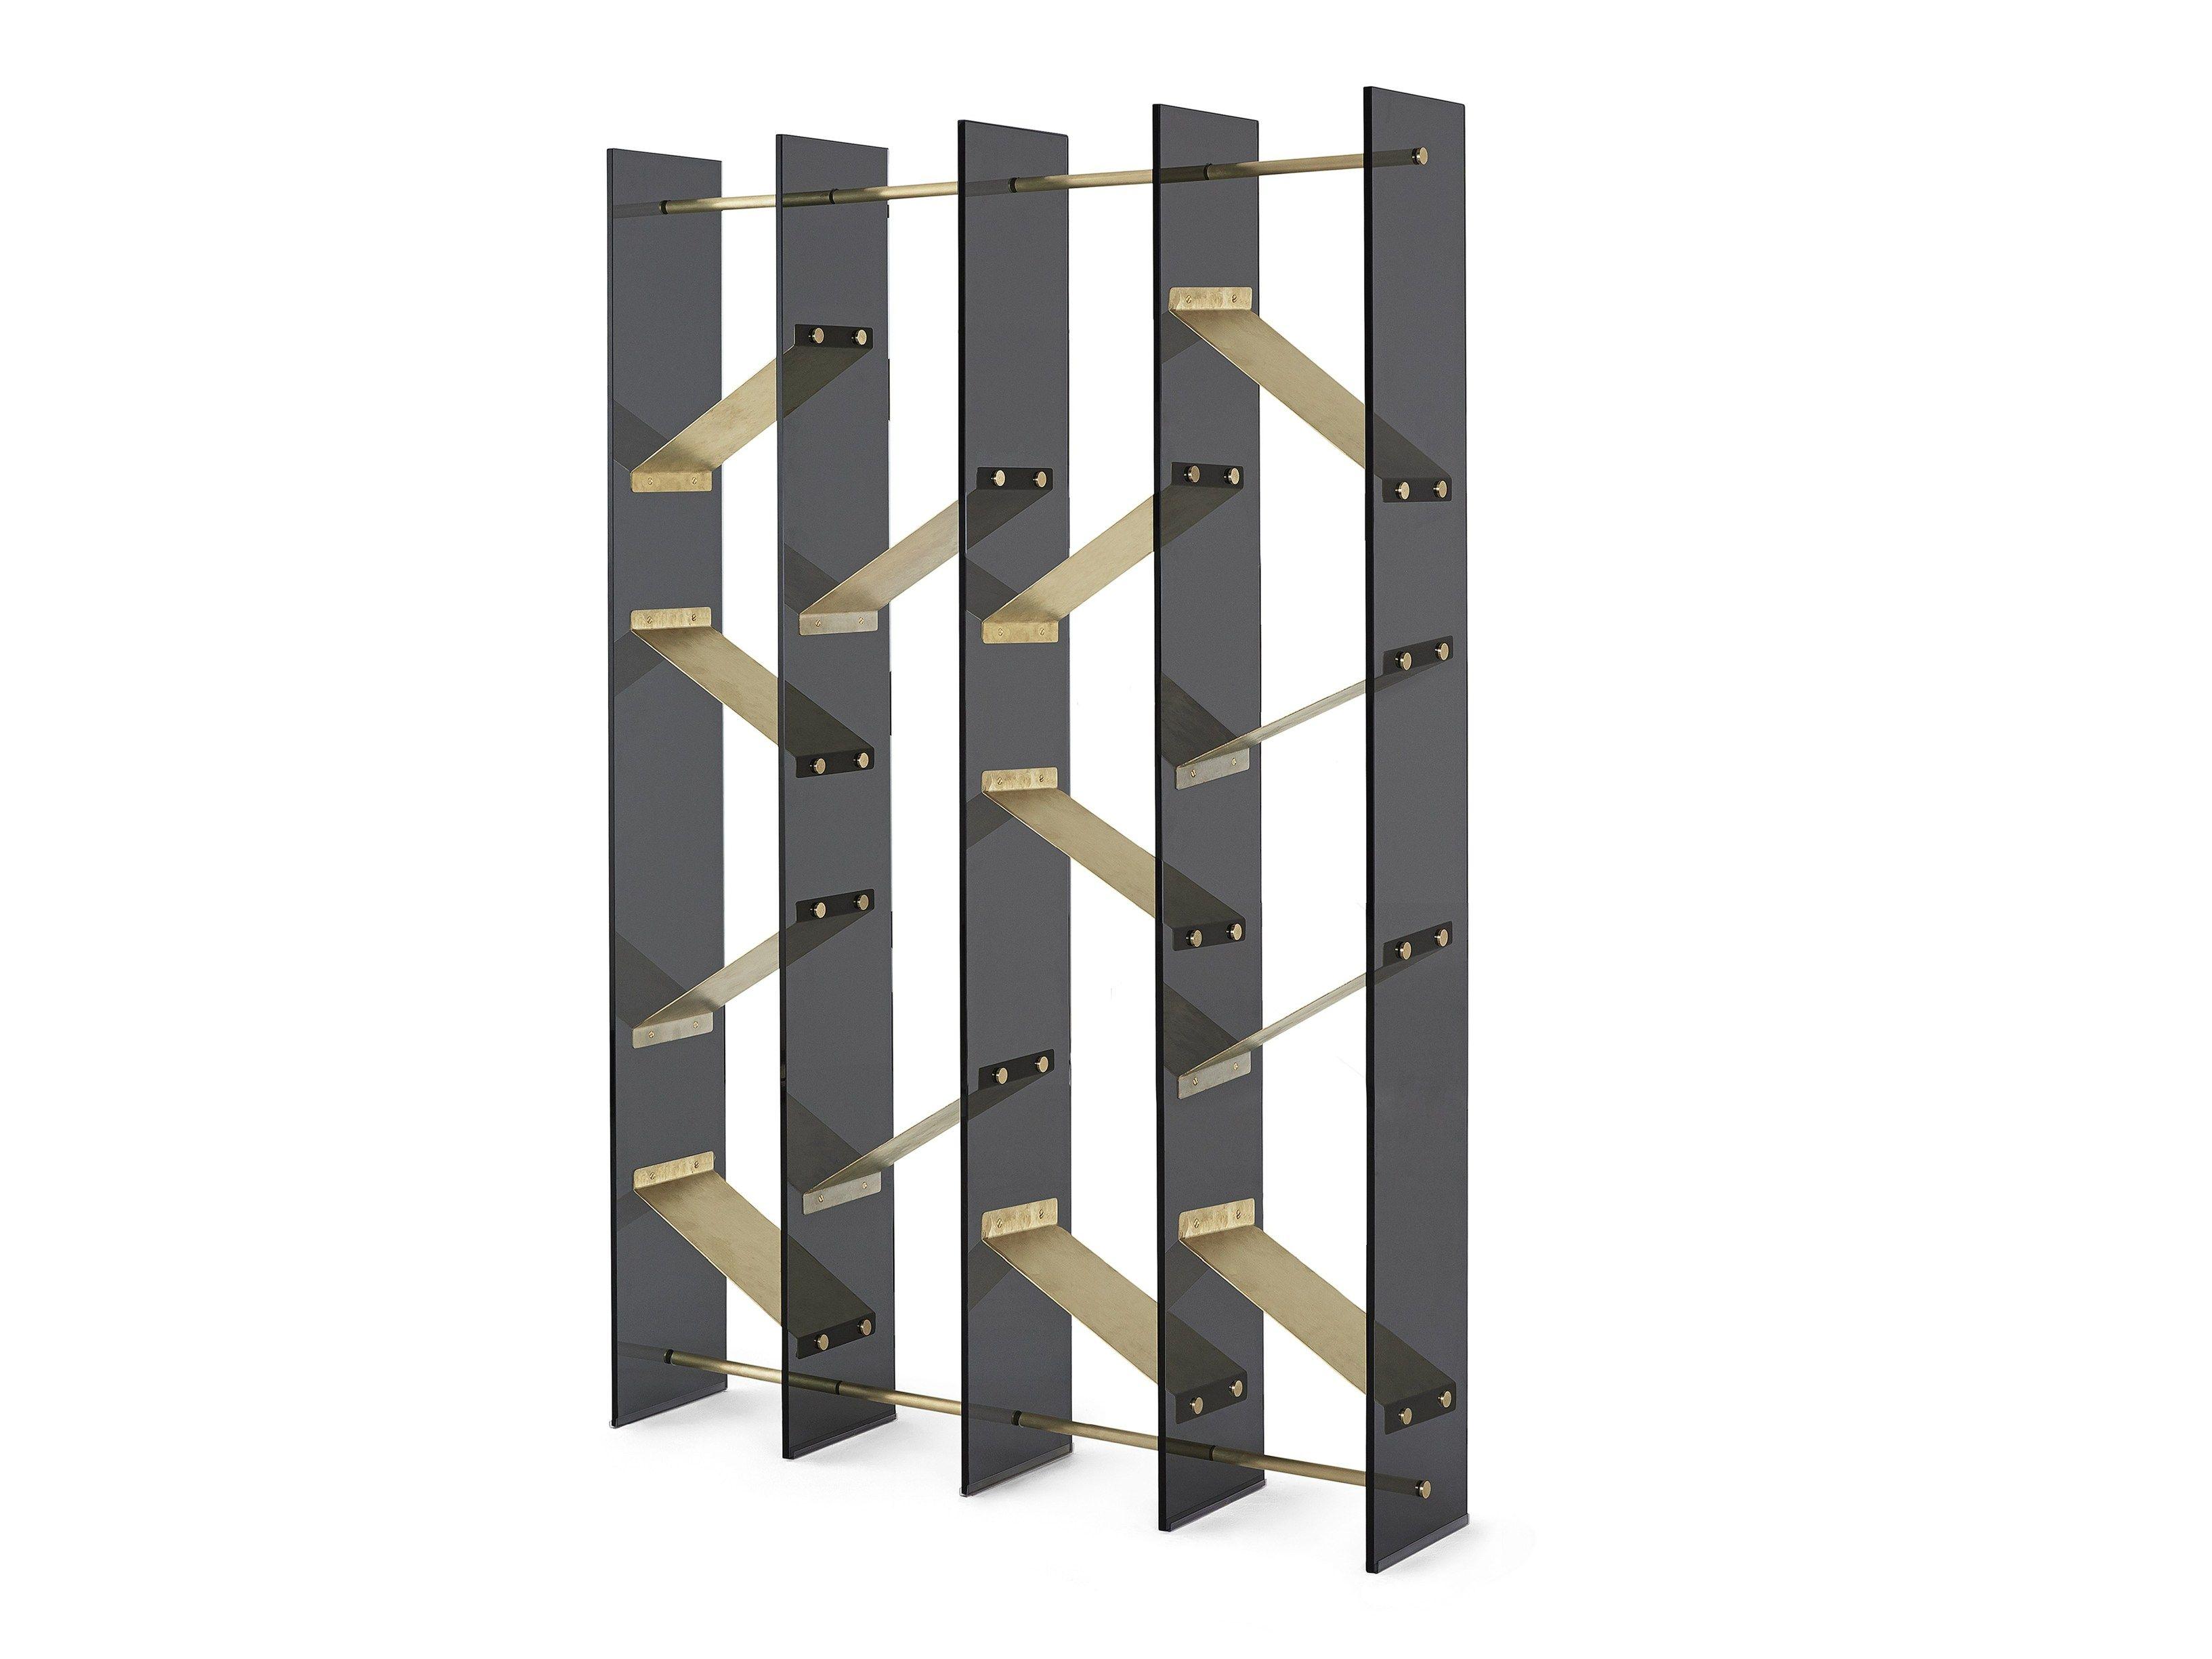 freestanding crystal bookcase isola by gallotti radice design massimo castagna. Black Bedroom Furniture Sets. Home Design Ideas